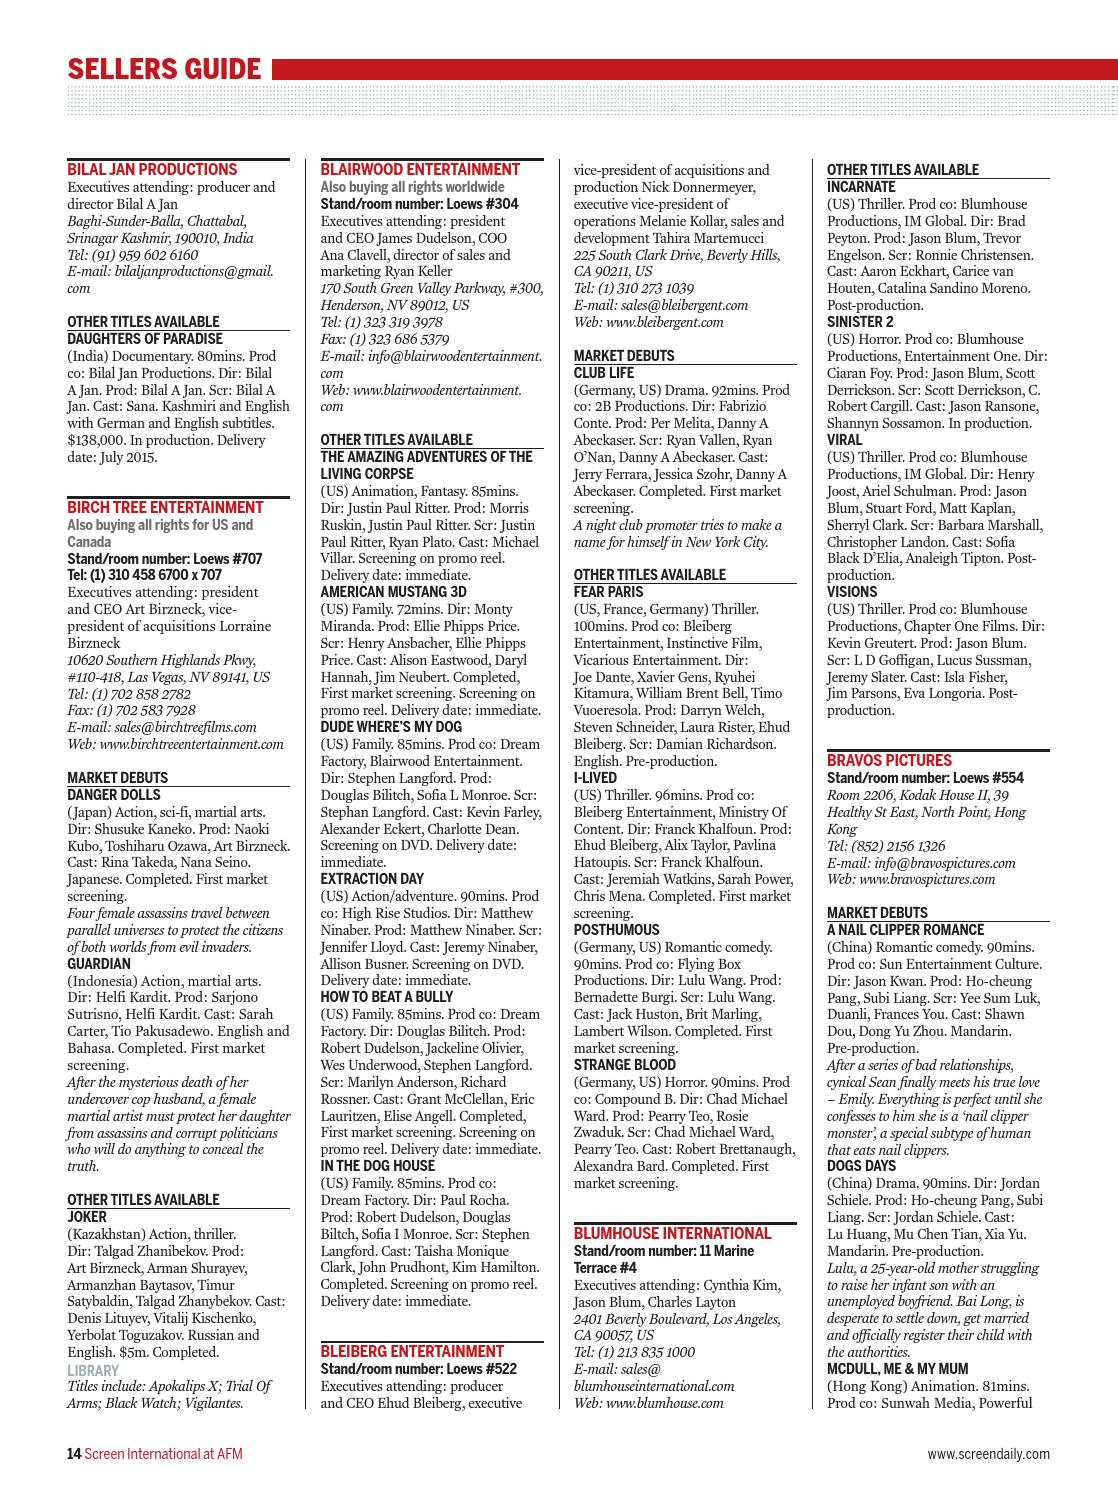 Screen AFM Bumper 2014 by Media Business Insight - issuu